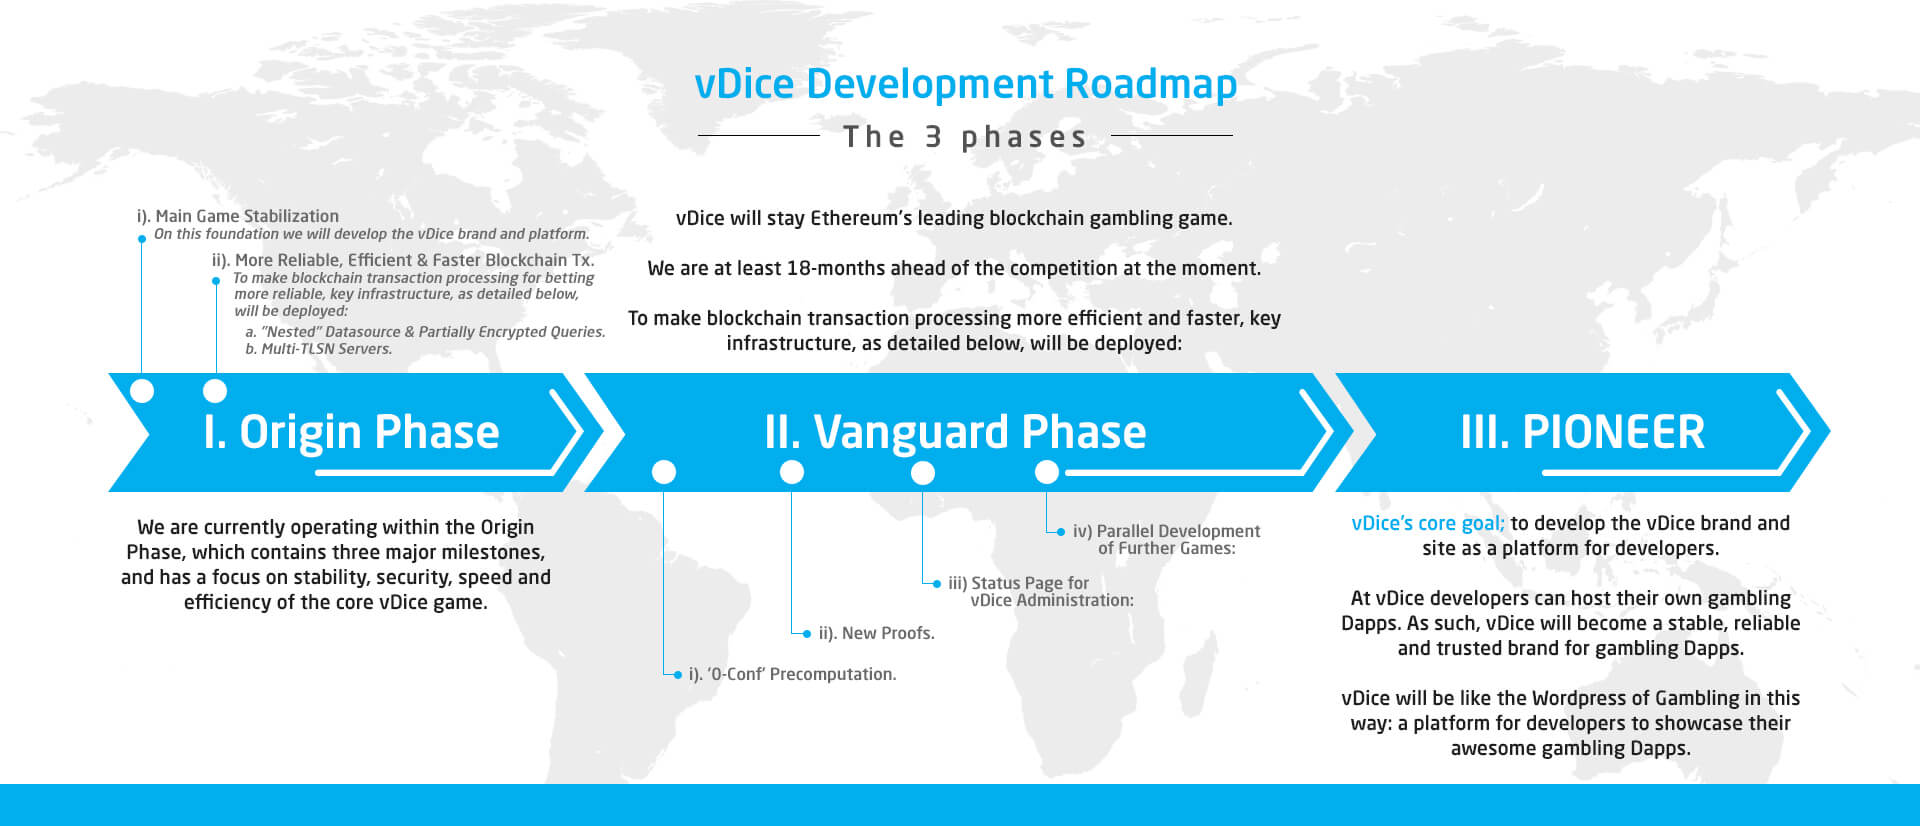 vDice Roadmap